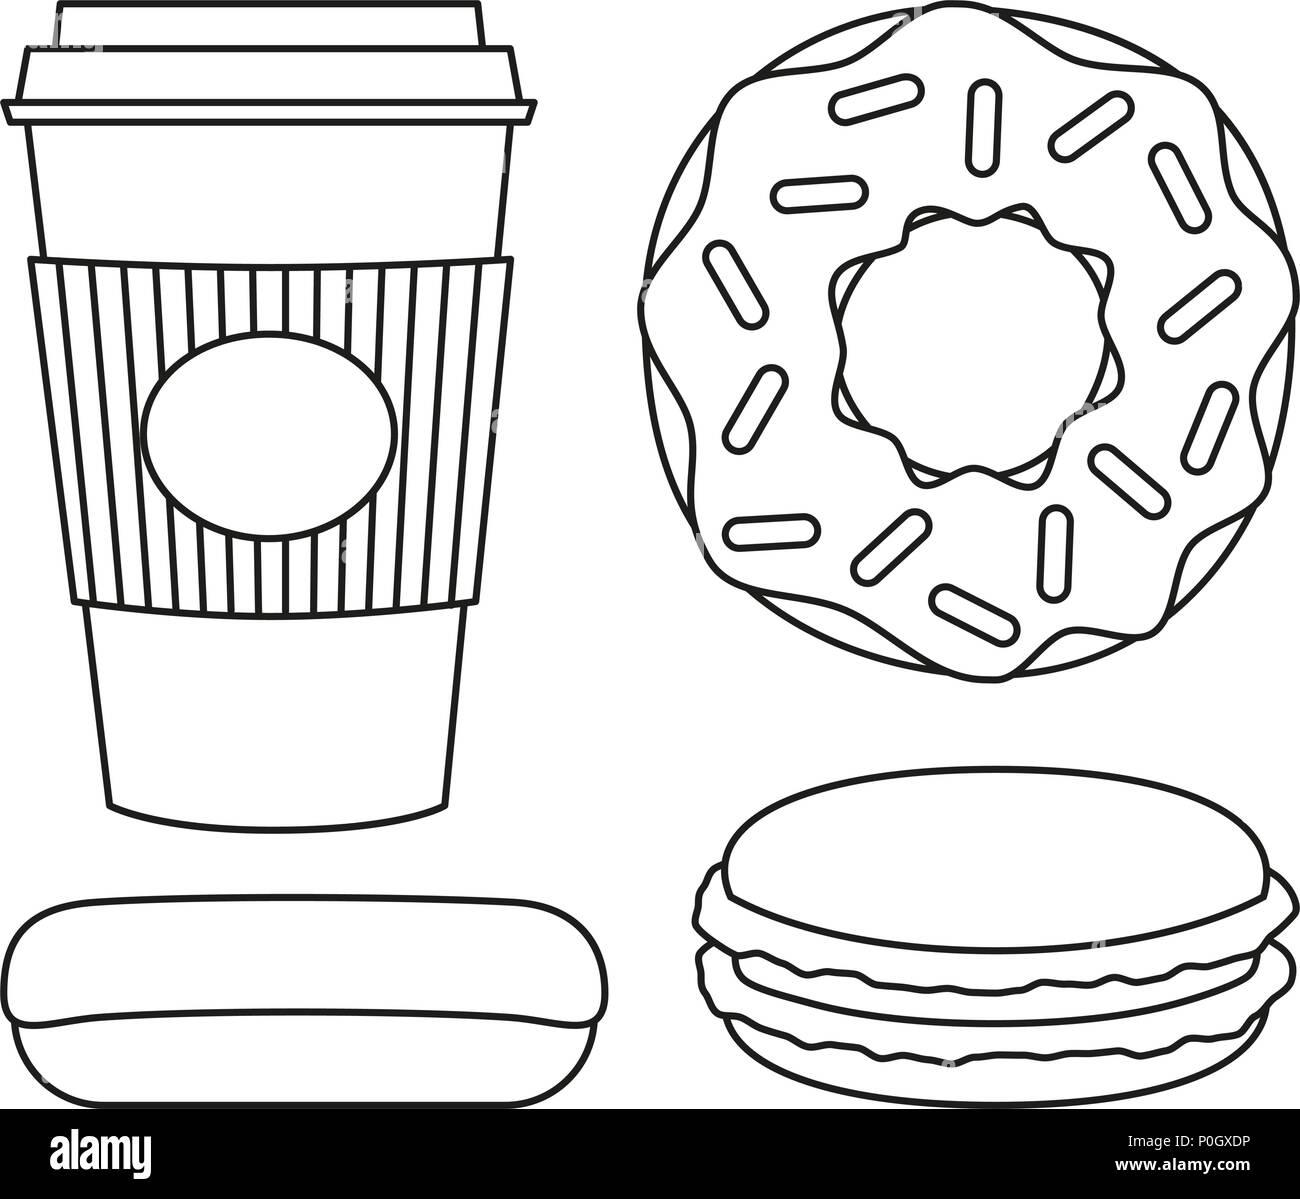 Vector Outline Sweet Donut Food Stock Photos Vector